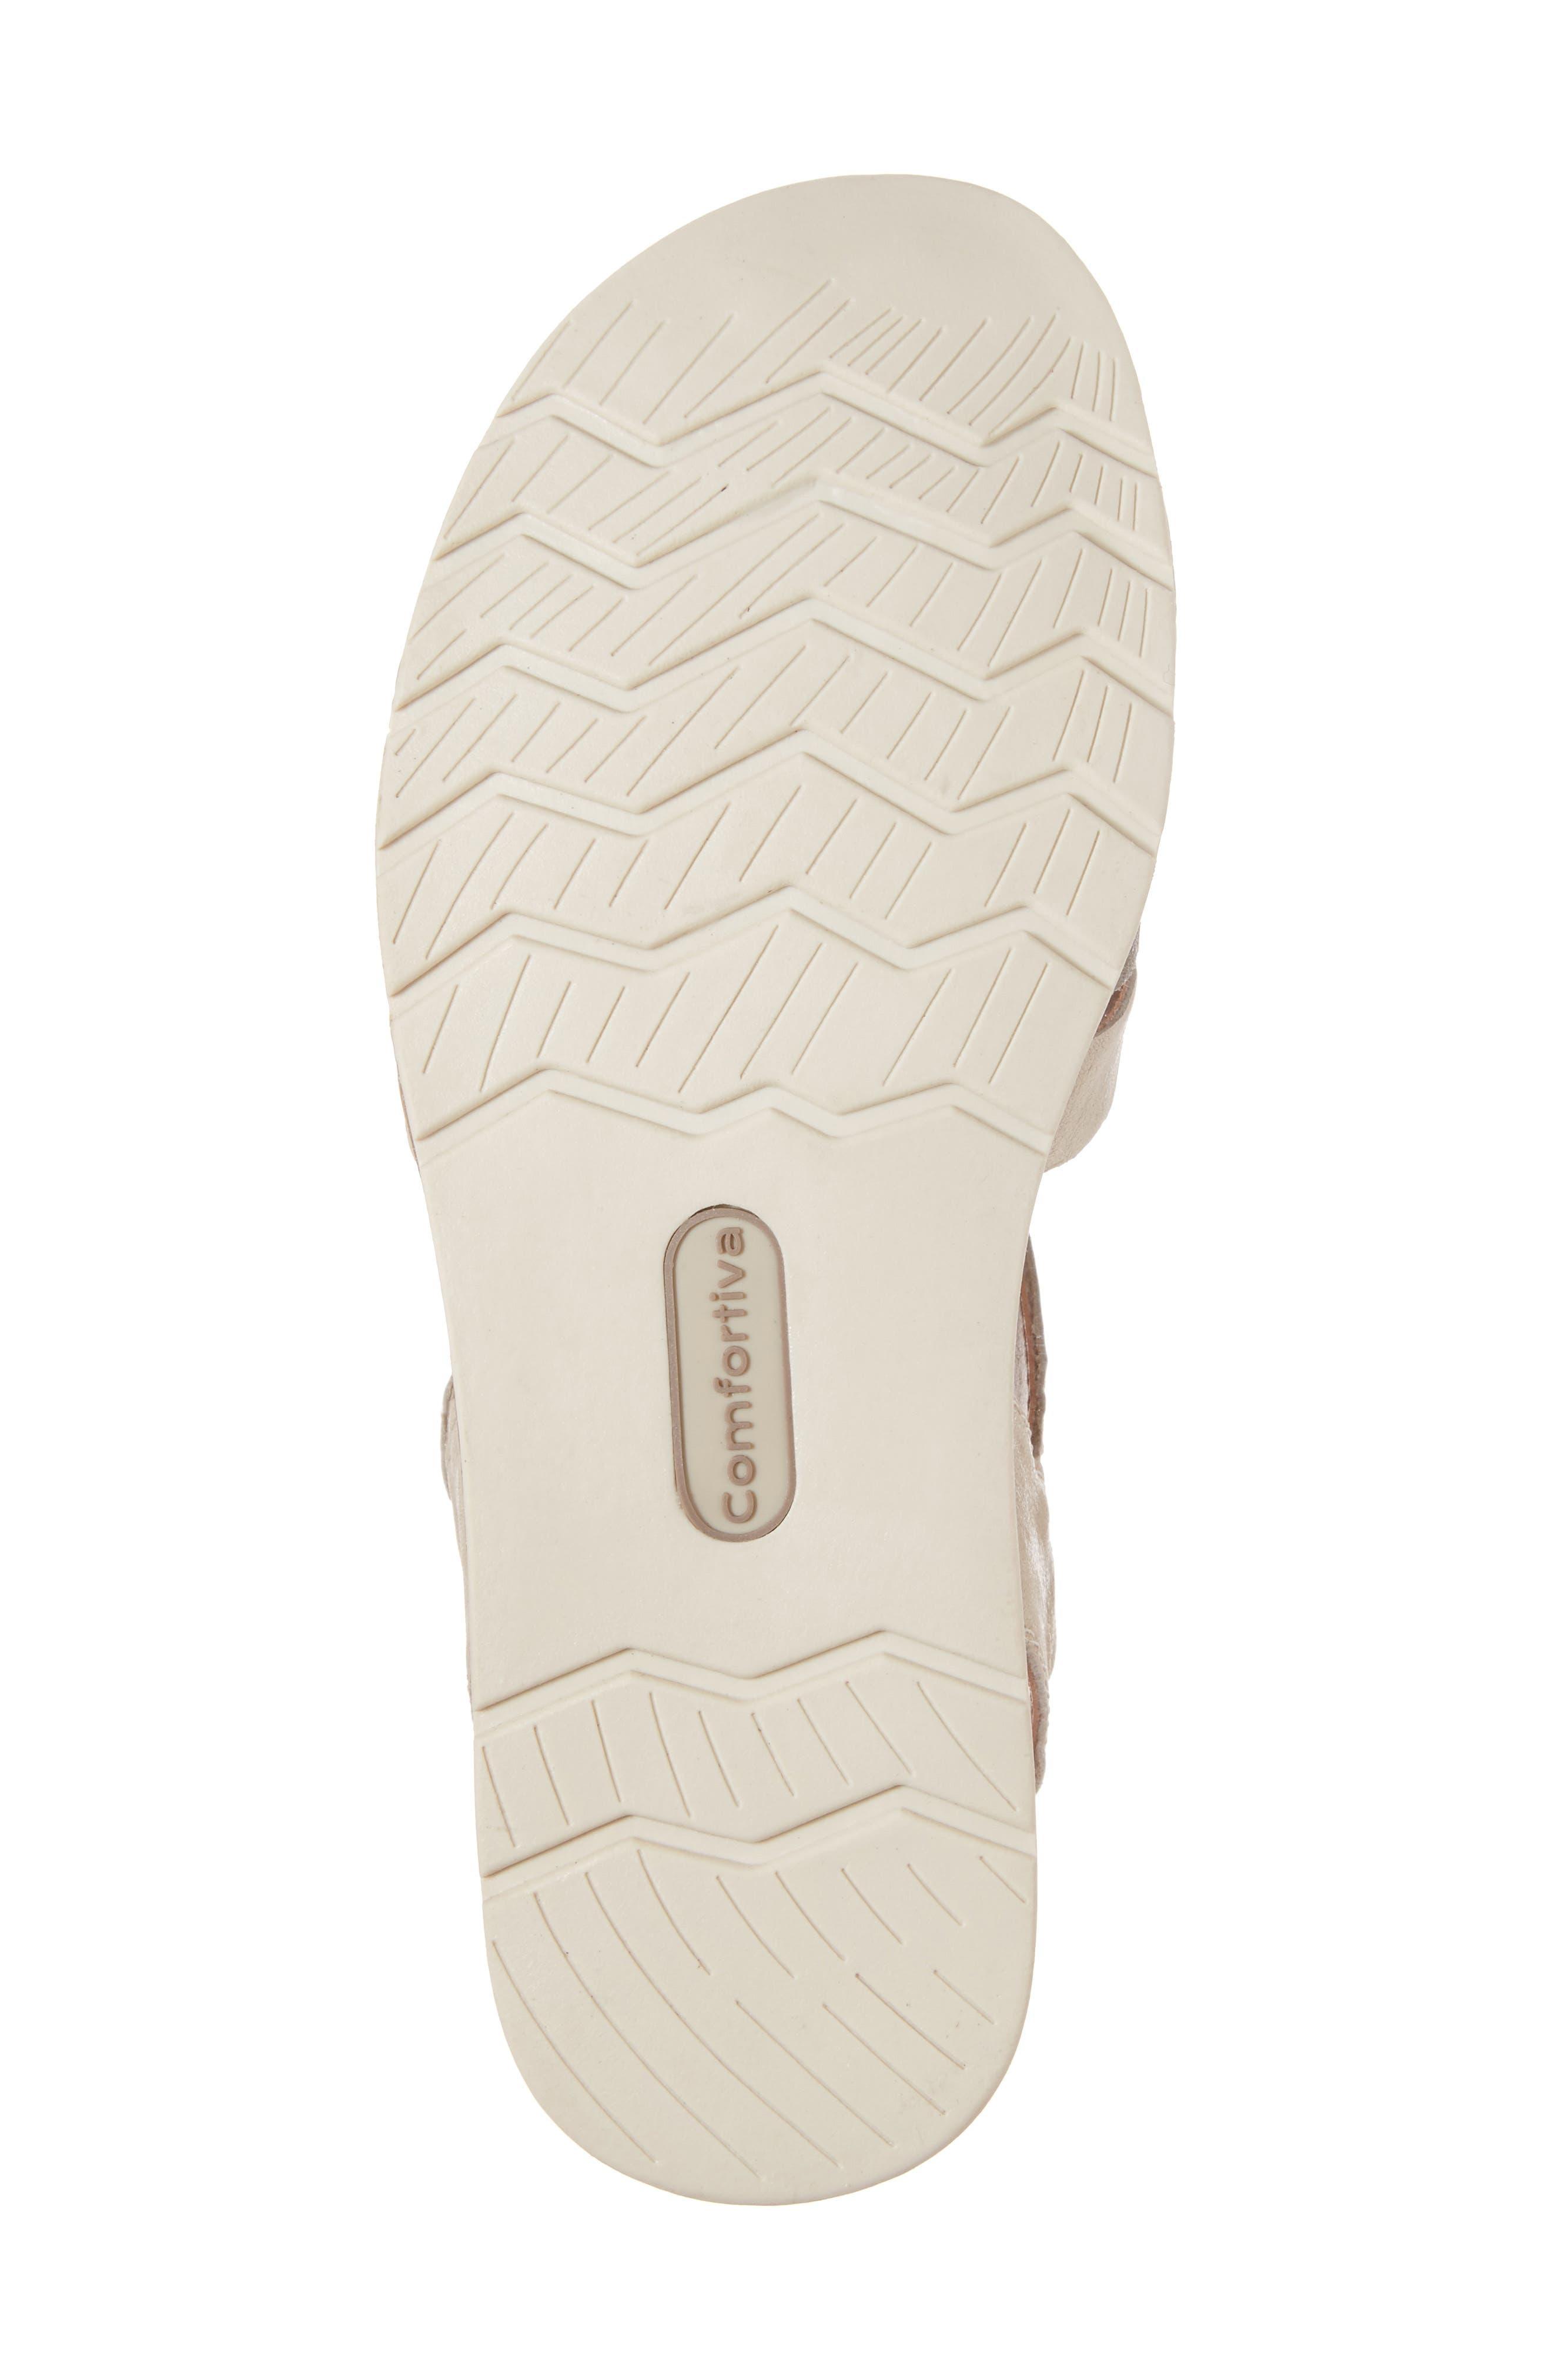 Alonsa Sandal,                             Alternate thumbnail 6, color,                             Light Grey/ Blush Leather